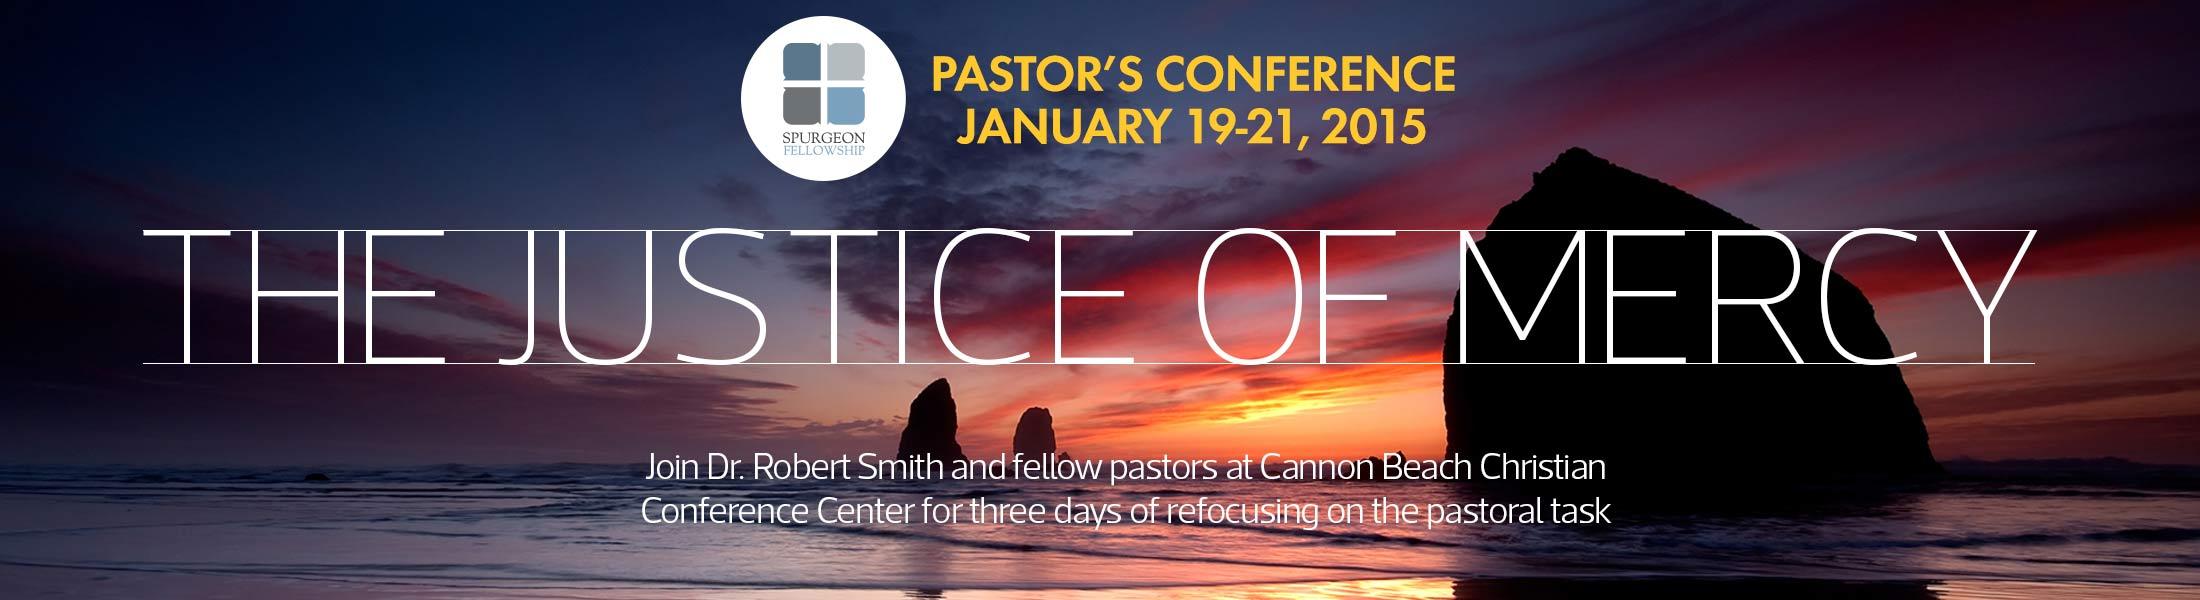 Spurgeon Fellowship Pastors Conference 2015